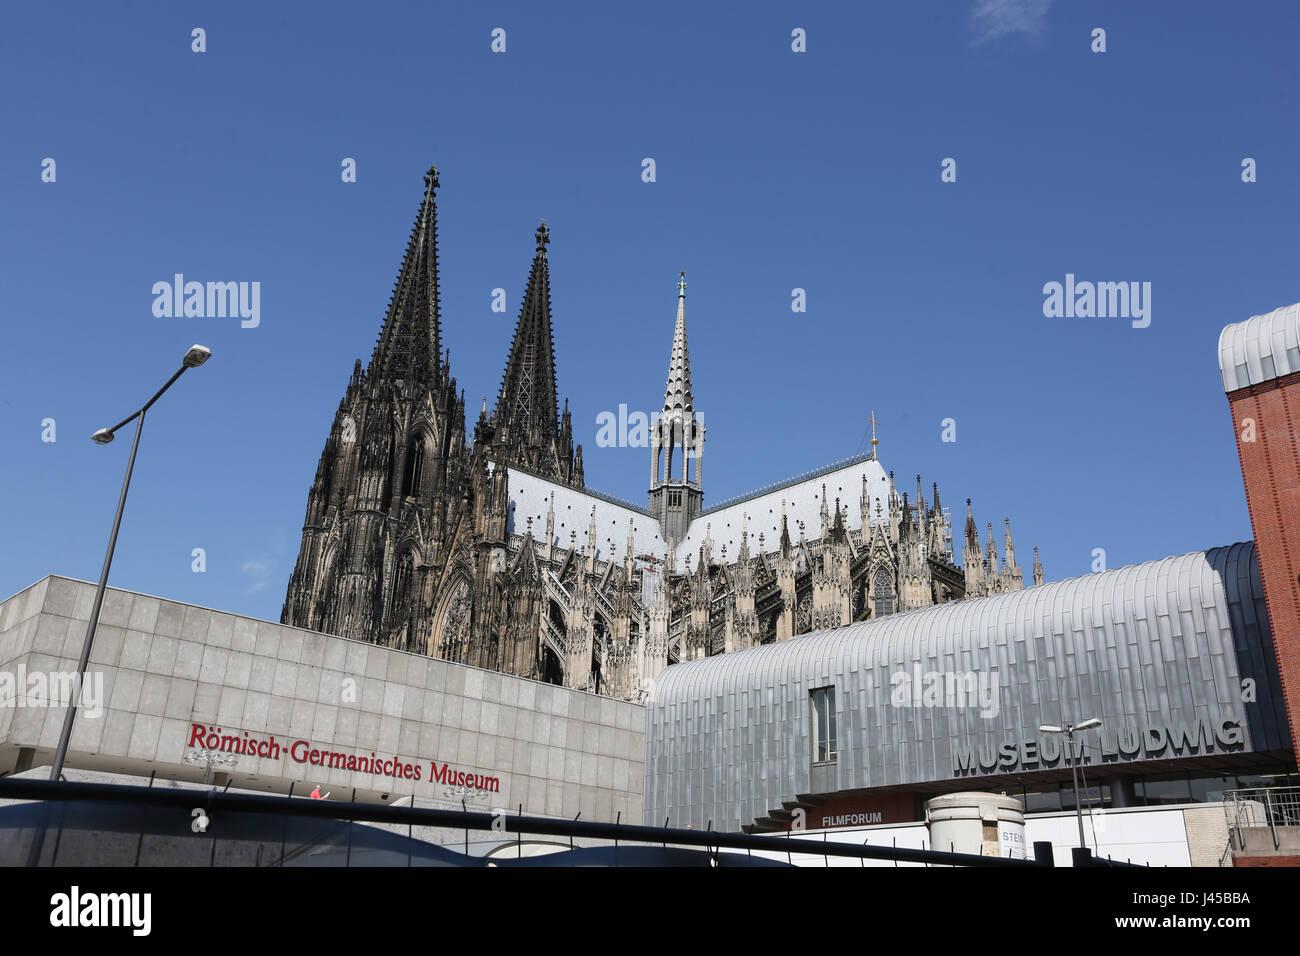 Germany, Cologne,Roman Germanic Museum, Römisch-Germanisches Museum,Köln Stock Photo